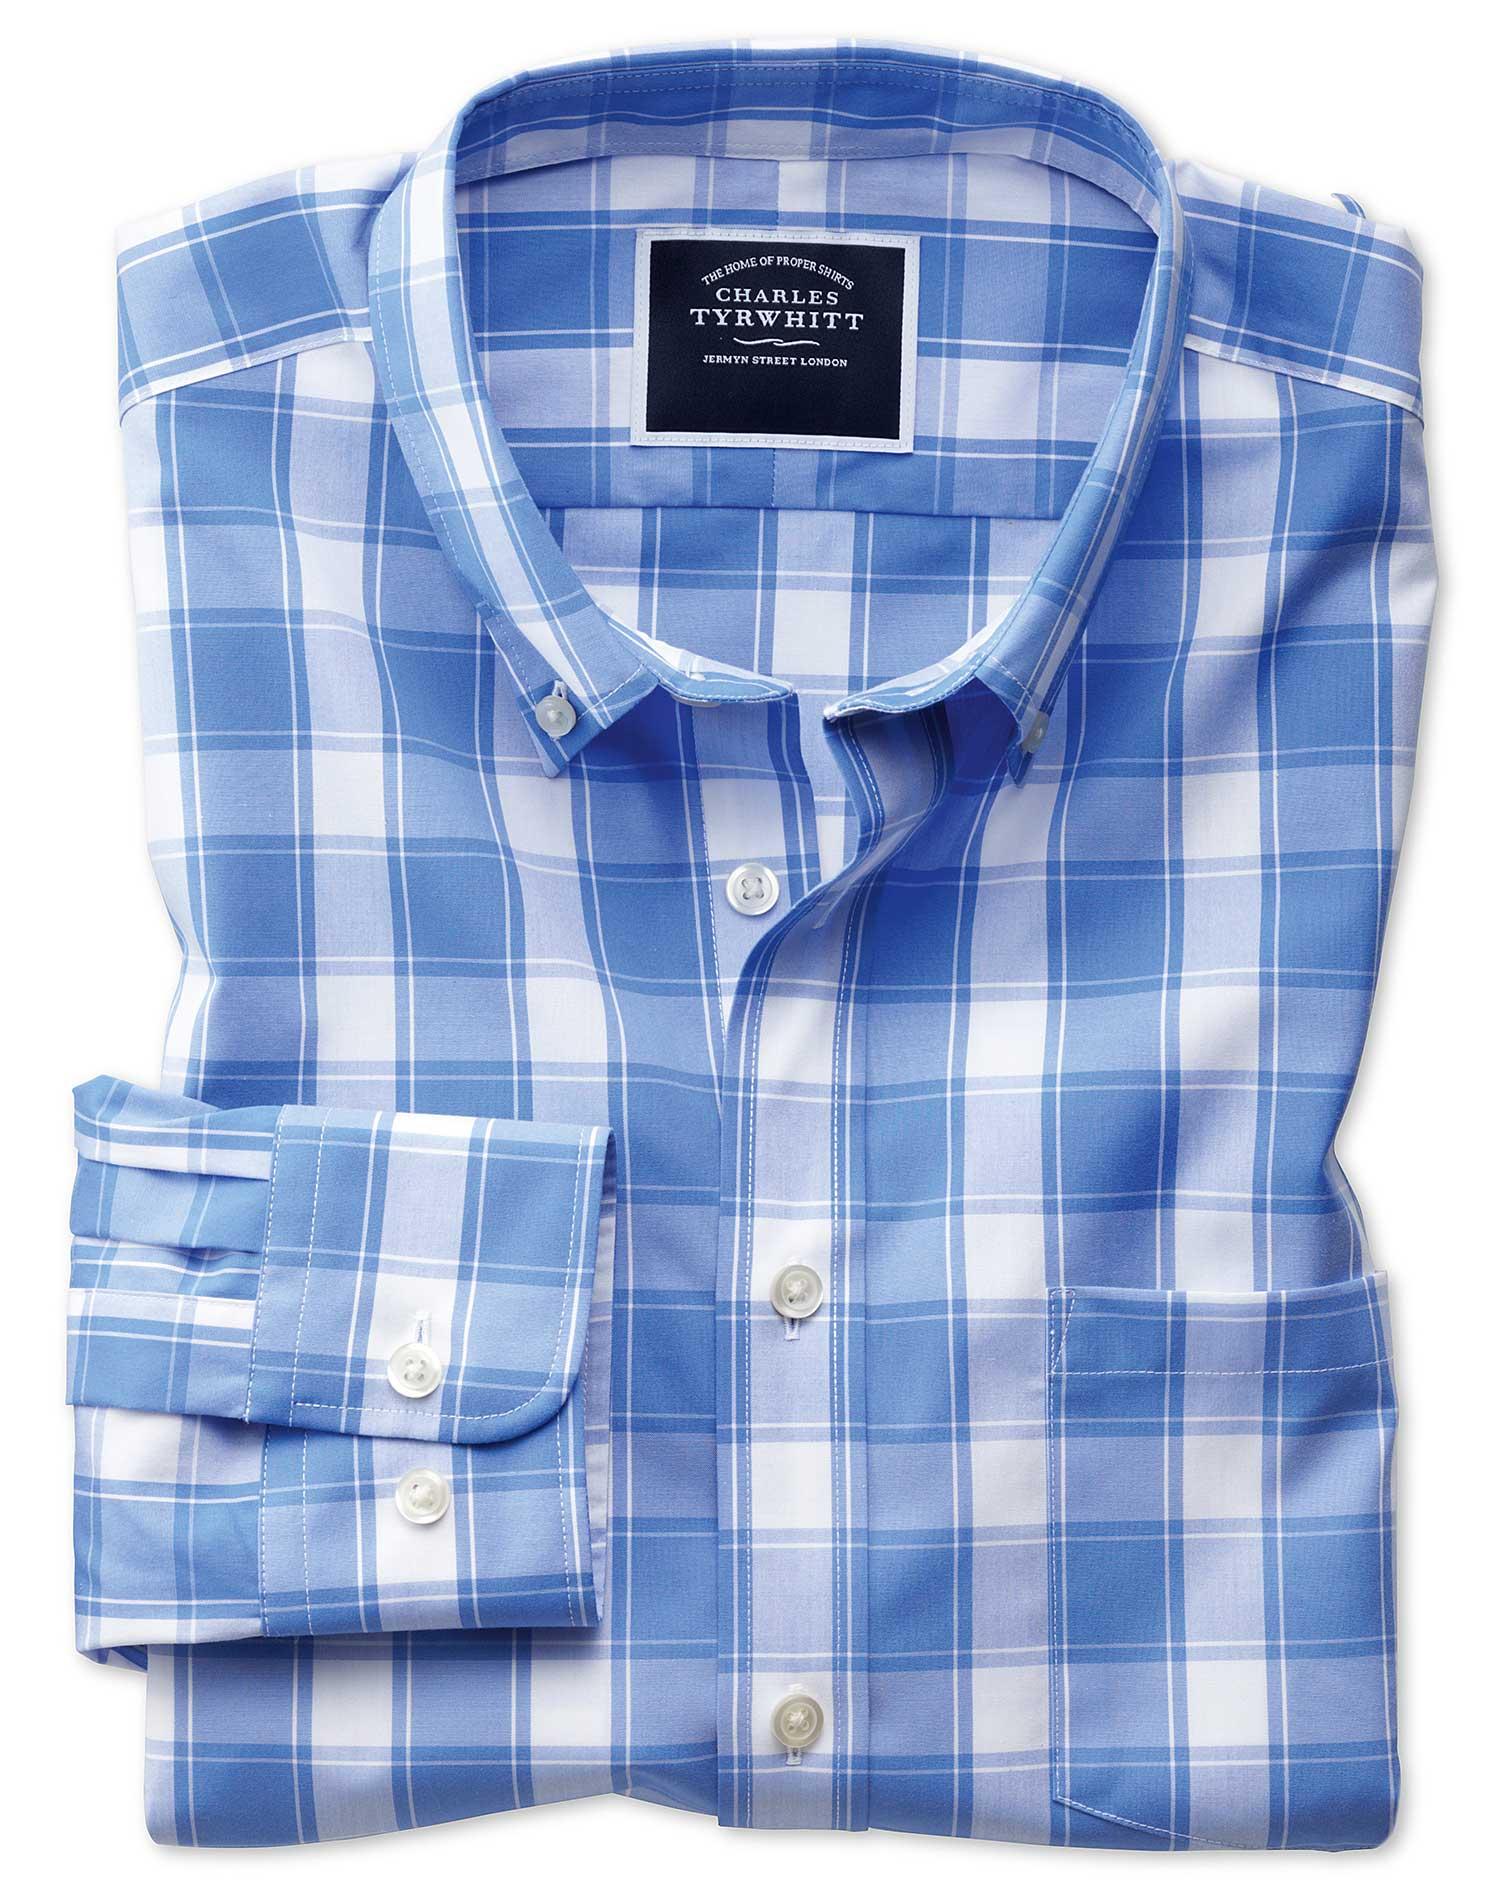 Classic Fit Button-Down Non-Iron Poplin Blue and White Check Cotton Shirt Single Cuff Size Medium by